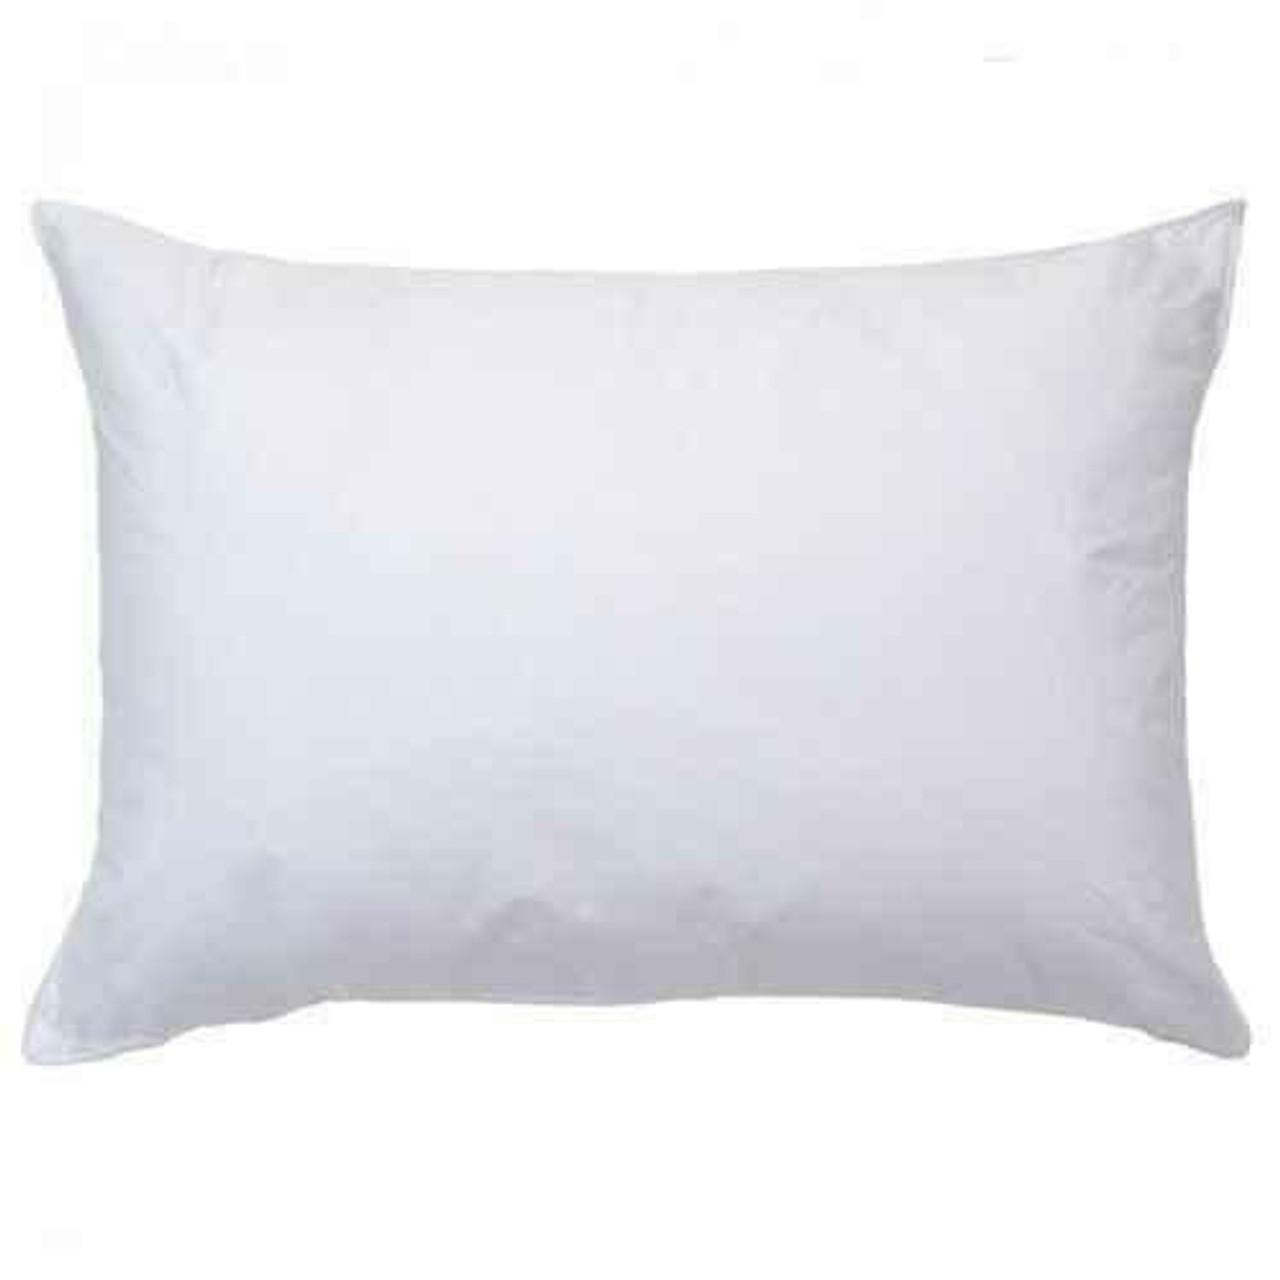 WestPoint/Martex Westpoint or Martex Basics or Hotel Pillow 20 Oz or 8-12 Per Case